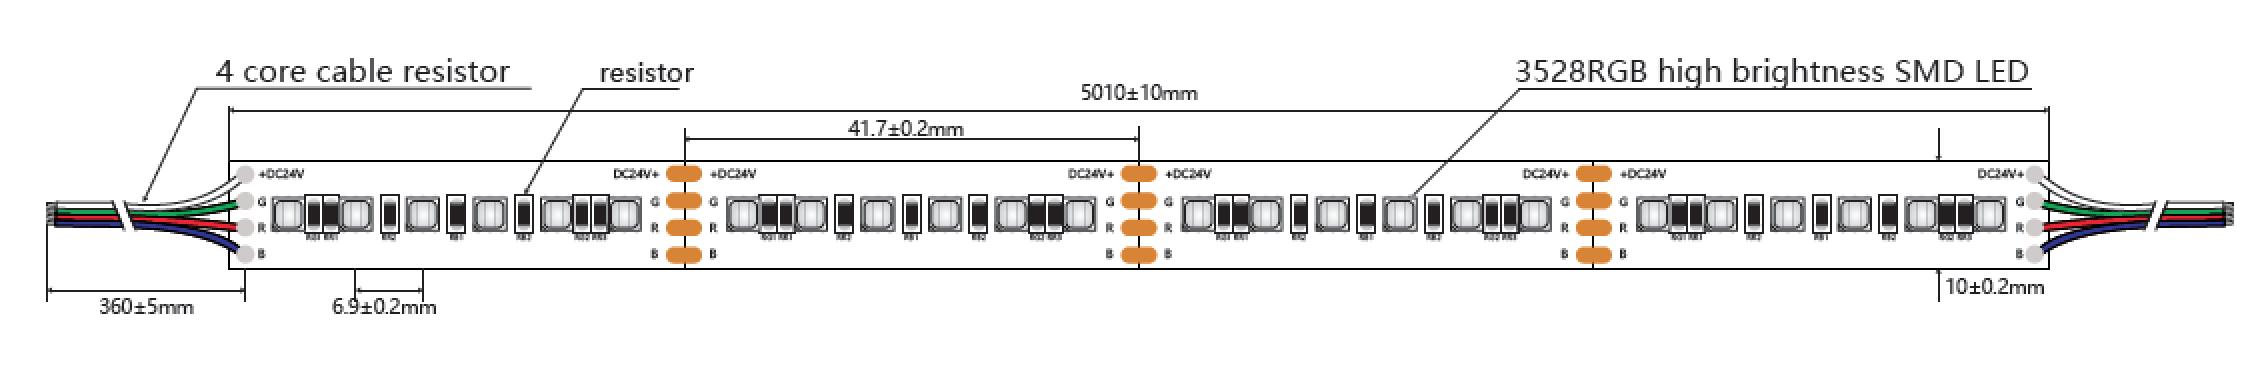 TLT-LX-175035 line drawing